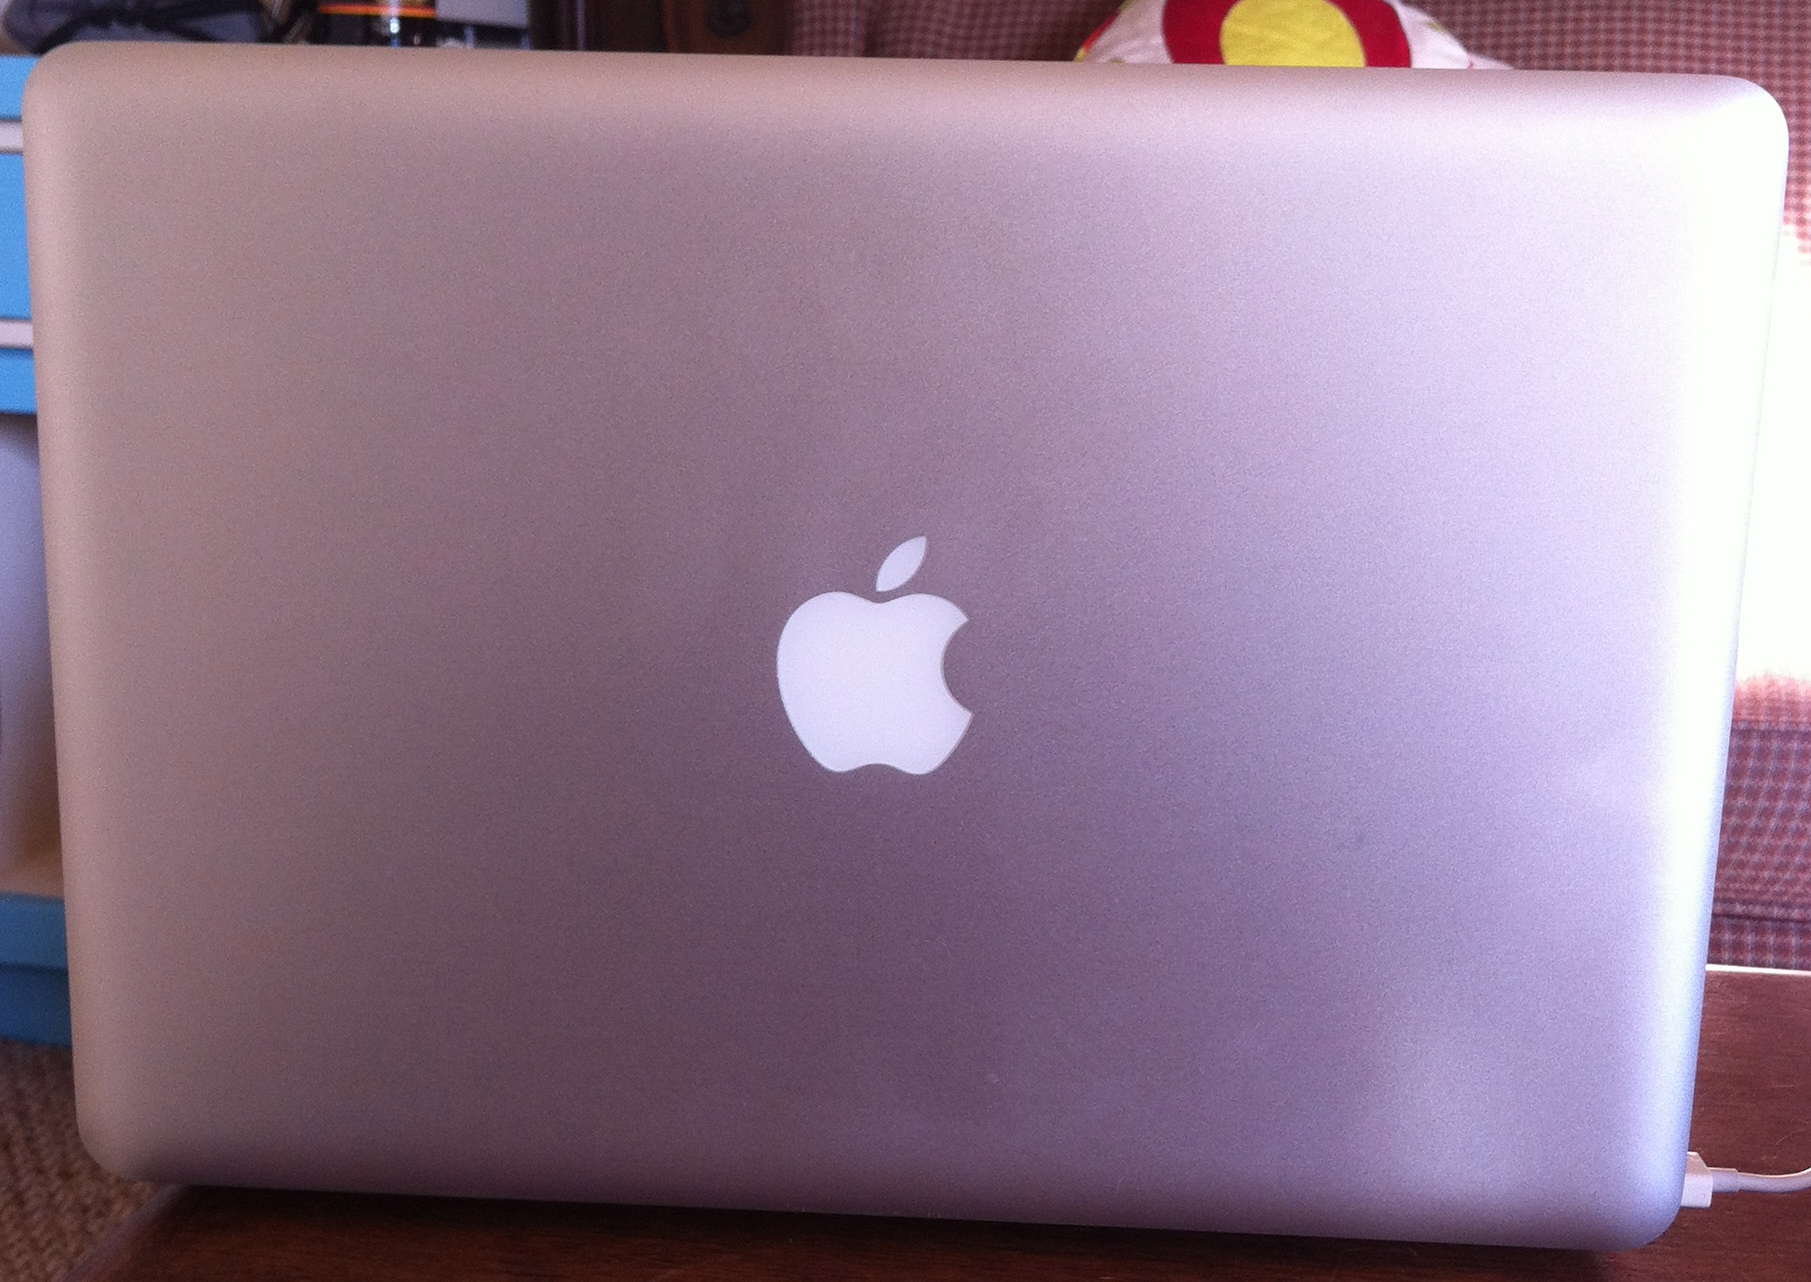 New MacBook Pro - Before